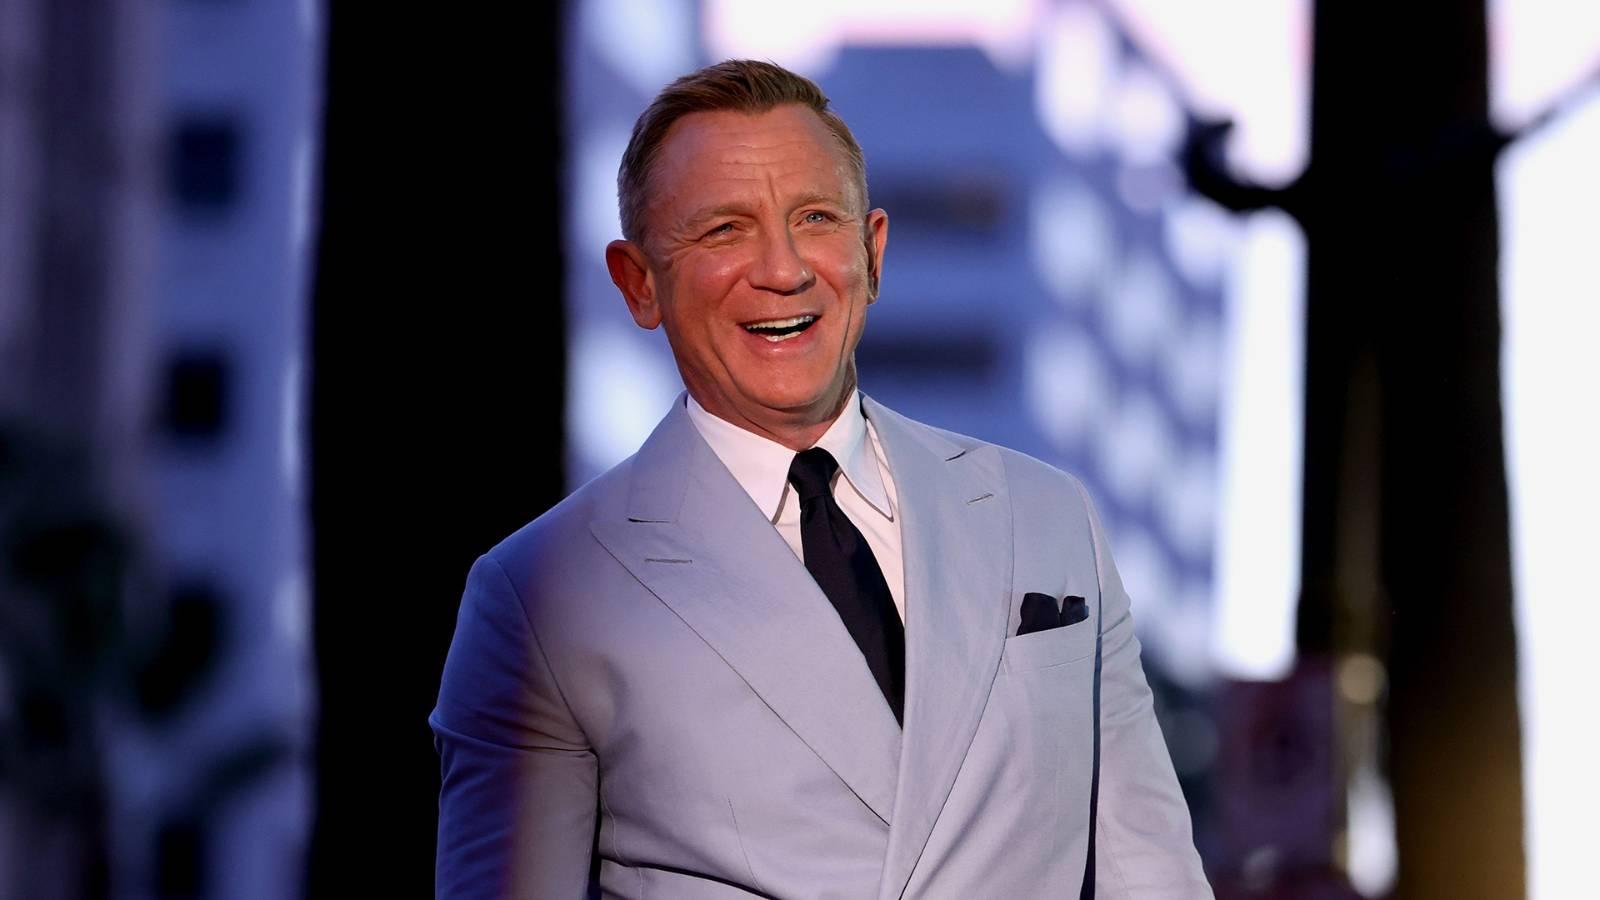 Daniel Craig explains why he likes going to gay bars more than 'hetero bars'